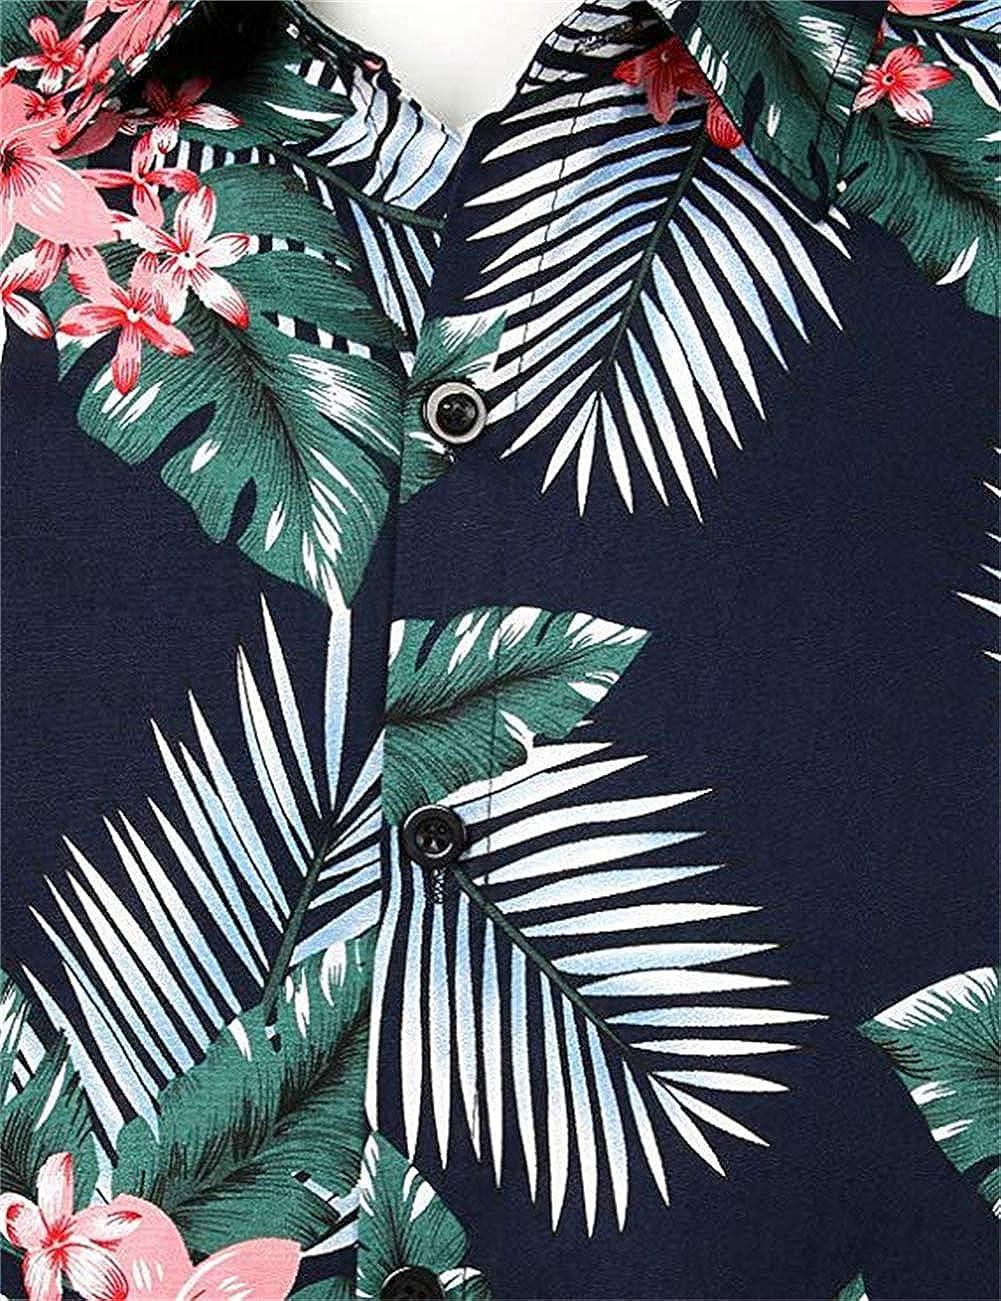 ZXLLZ Hawaiian Shirt Short Sleeve Front Pocket Hawaiian Print Bike Party Flower Beach Men Multicolored-2,Small